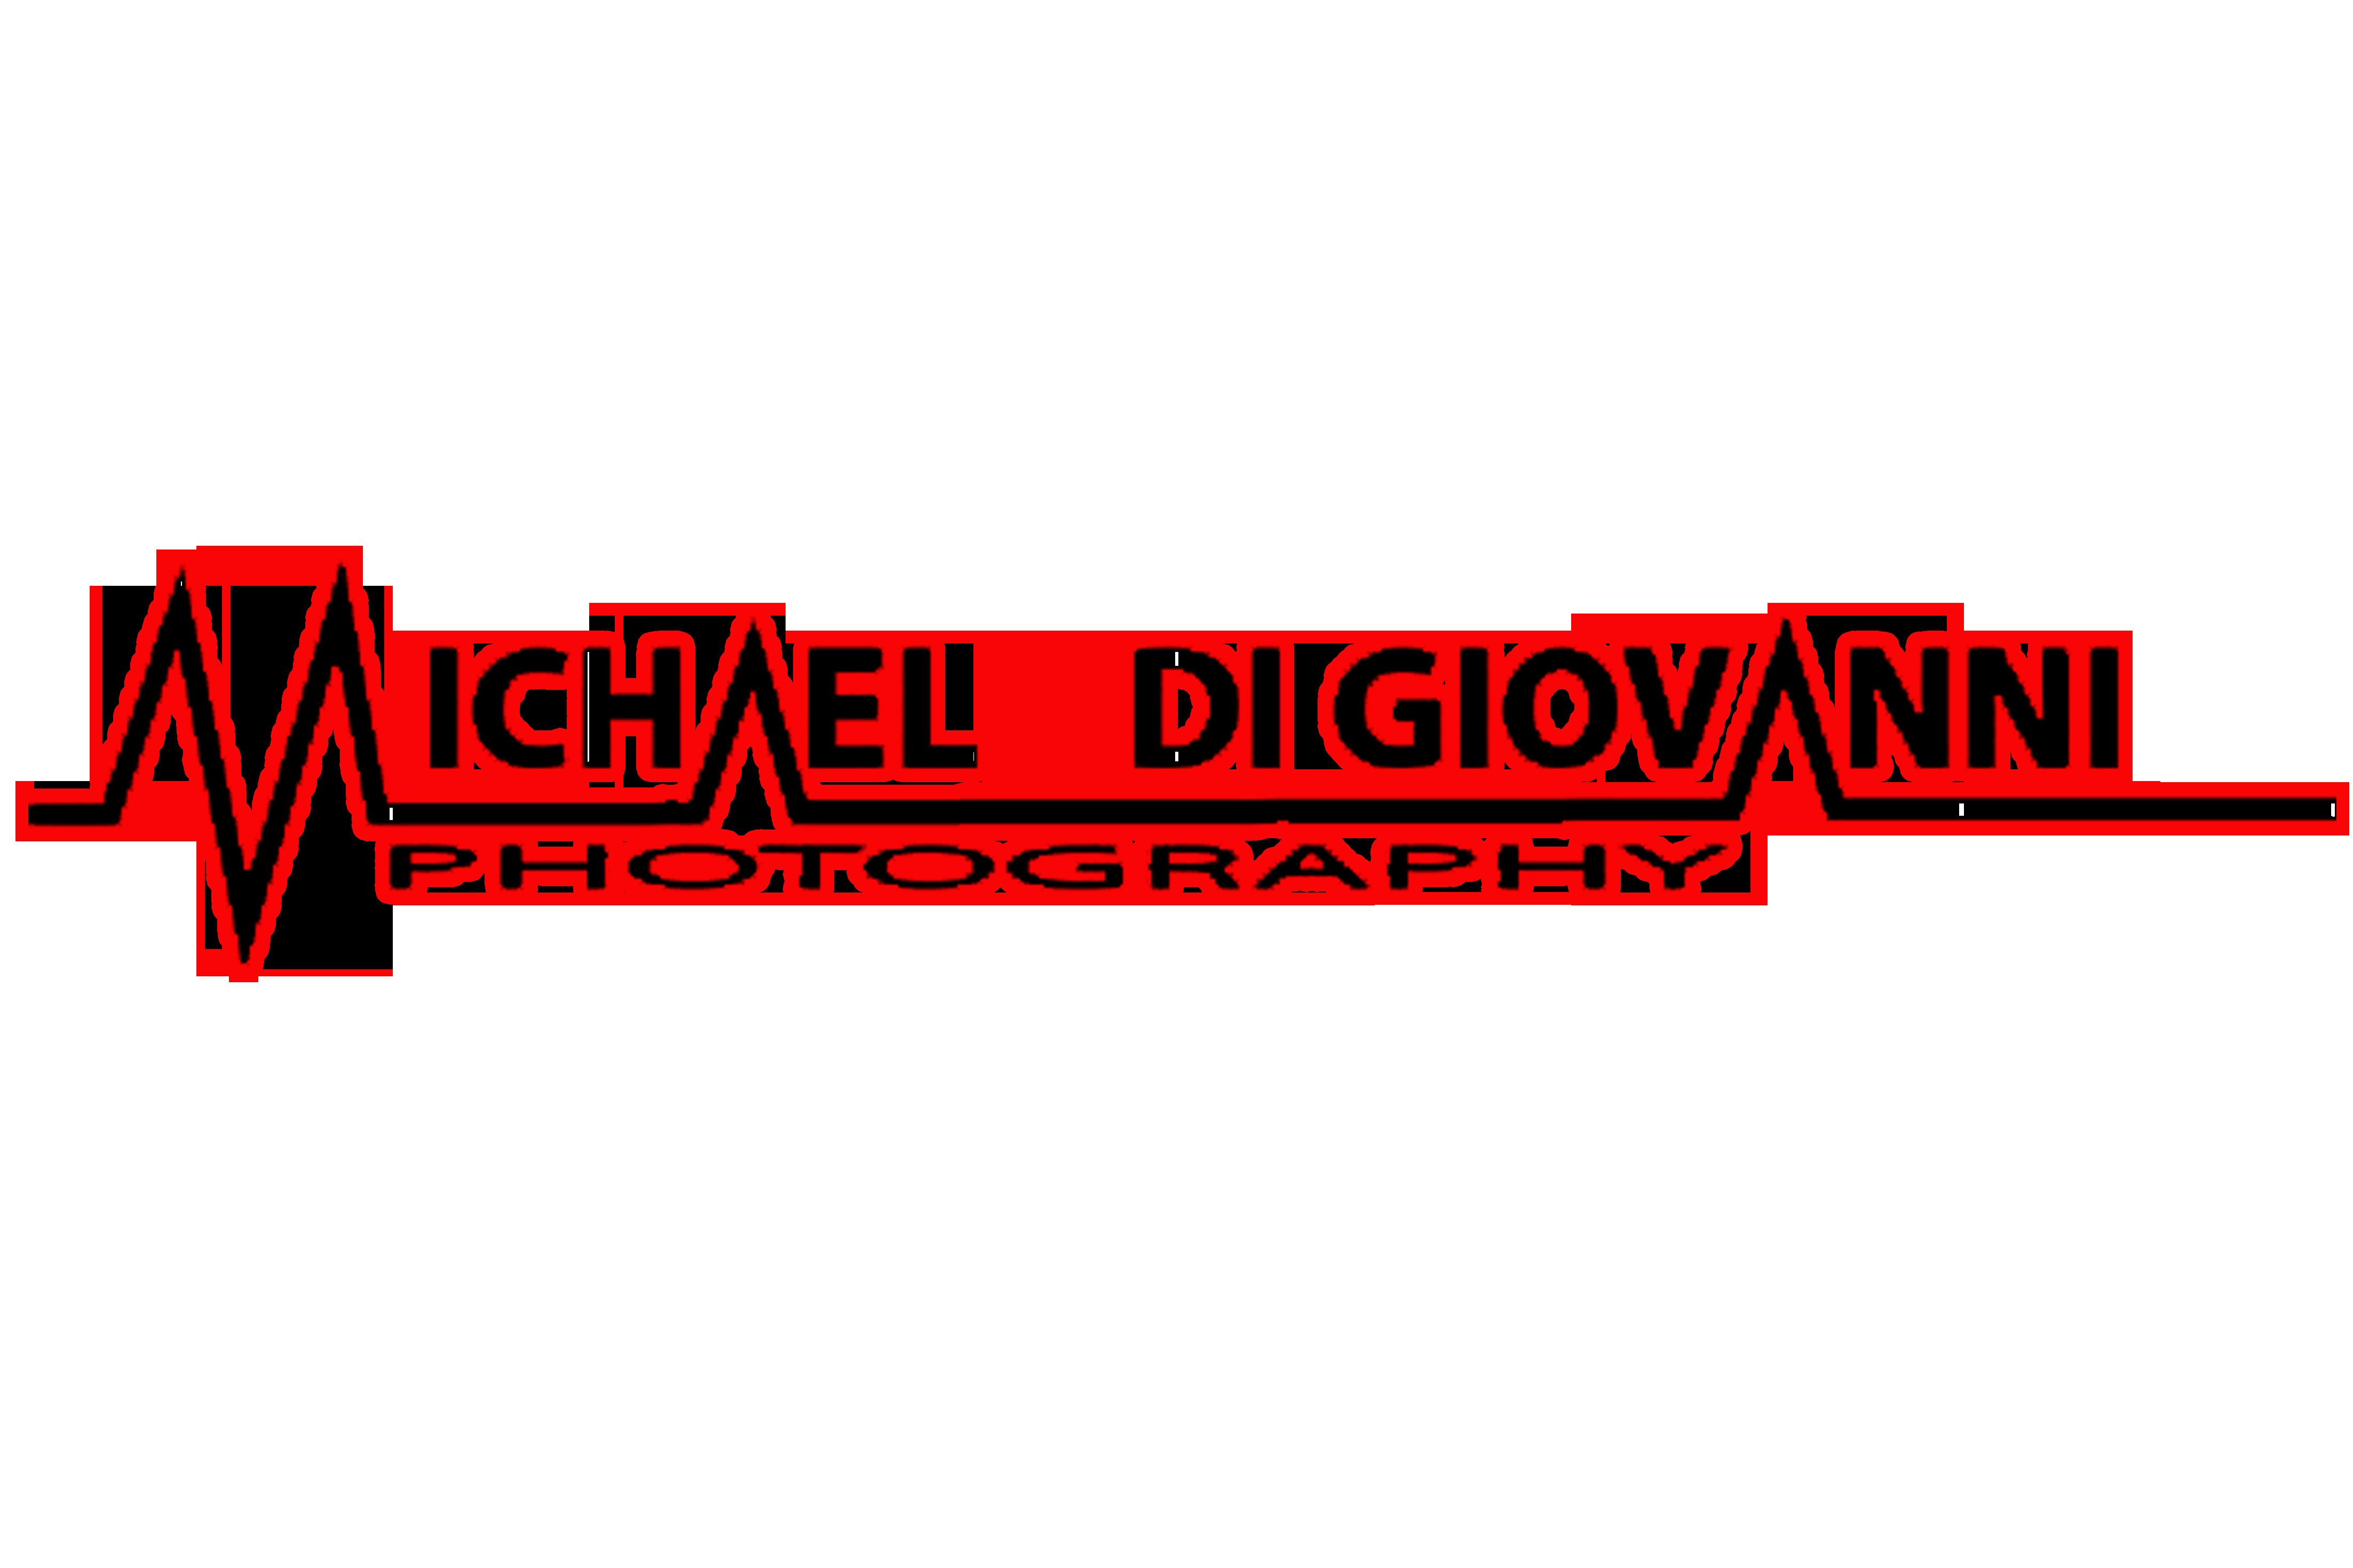 Michael DiGiovanni Photography